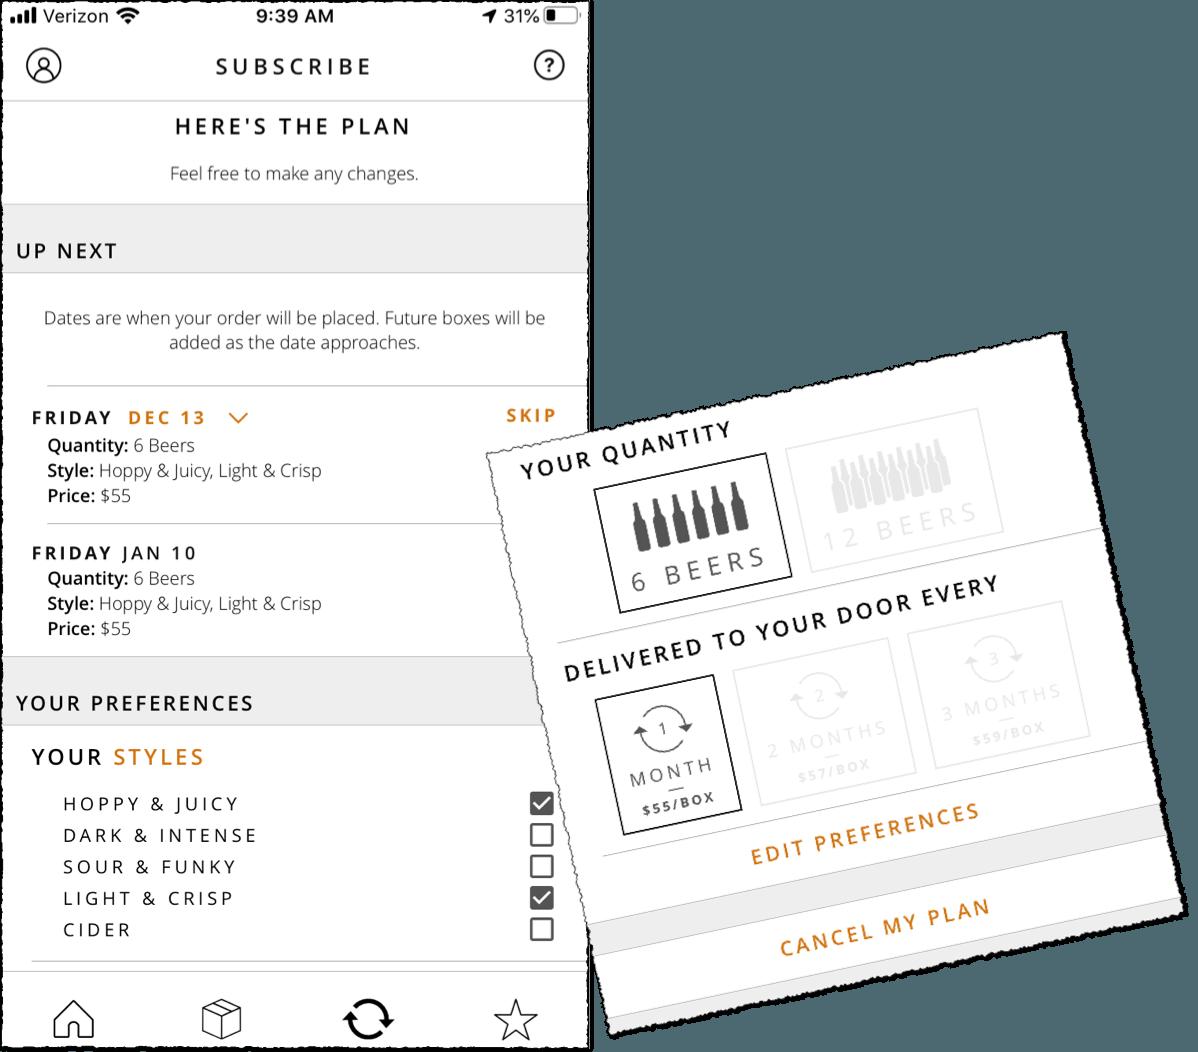 tavour beer subscription box screenshot of app